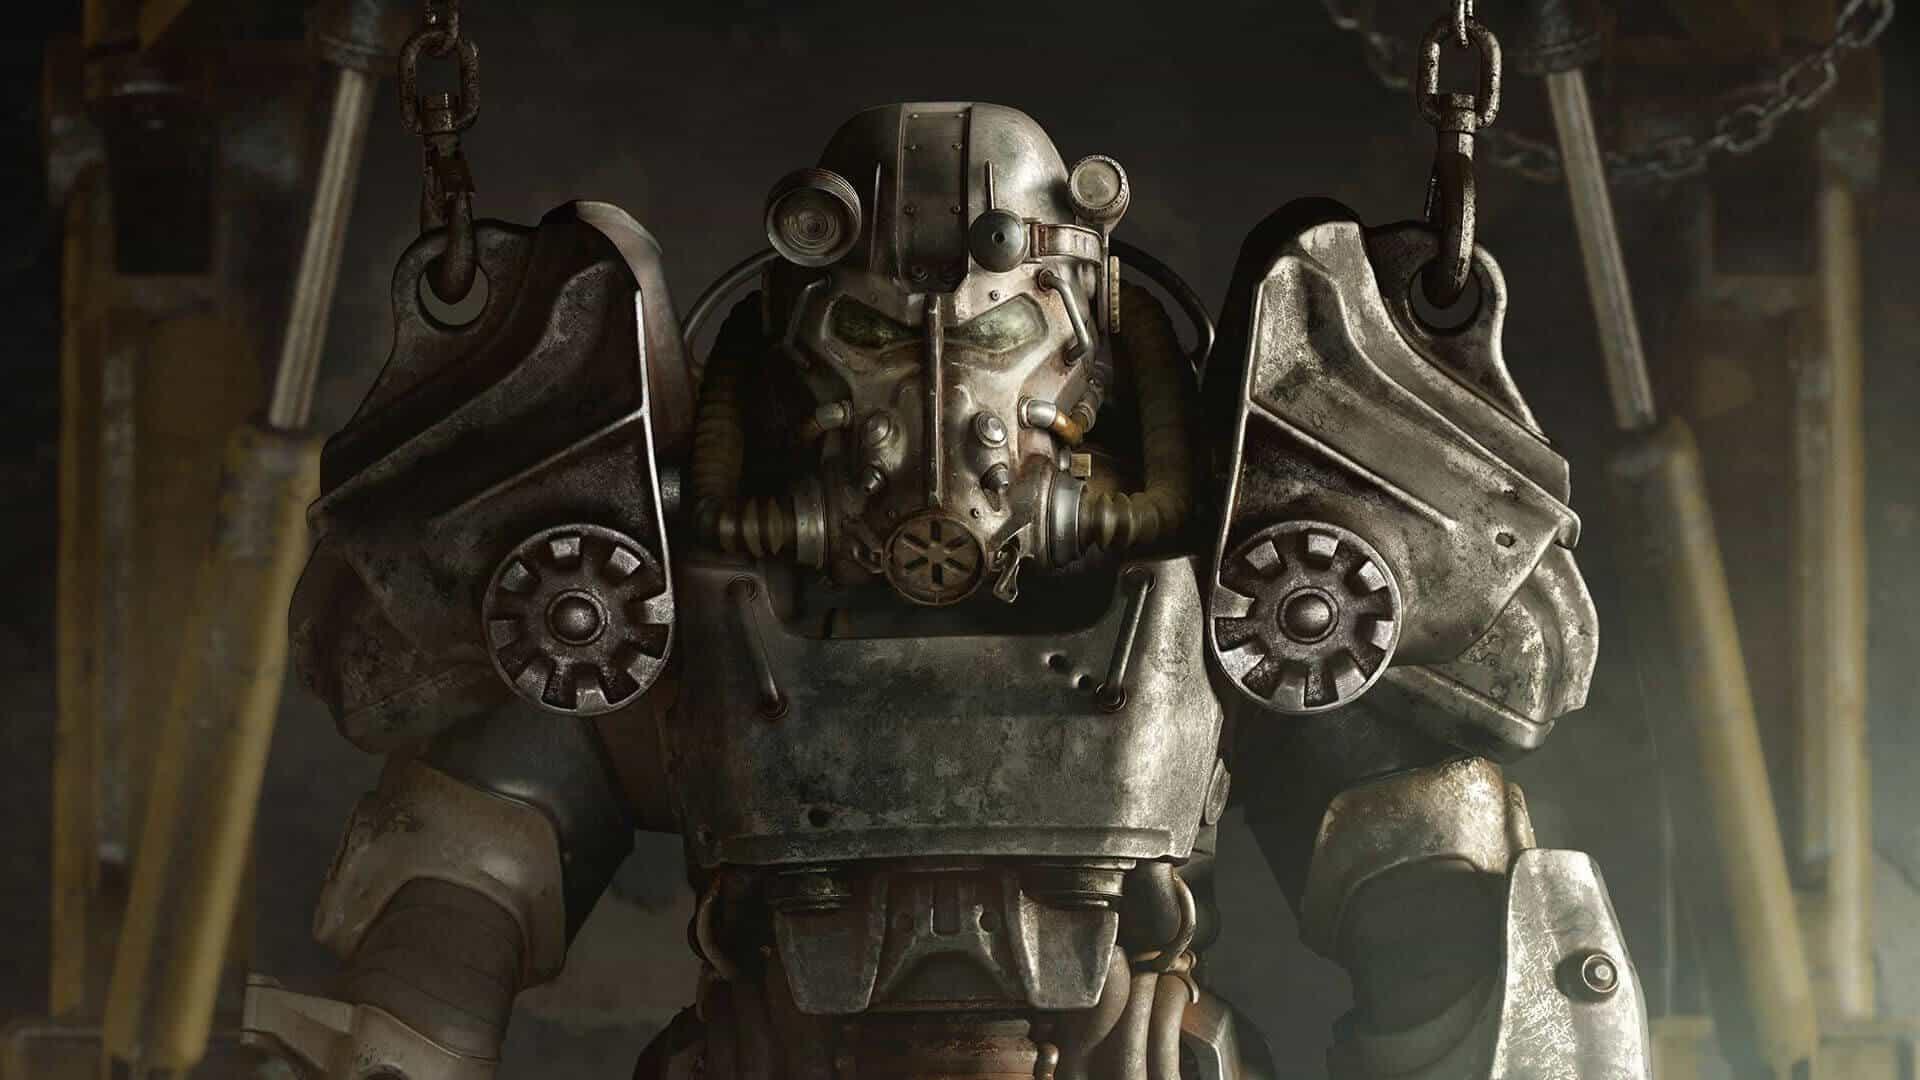 بازی ویدیویی فال اوت ۴ (افسردگی ۴) - Fallout 4 Video Game